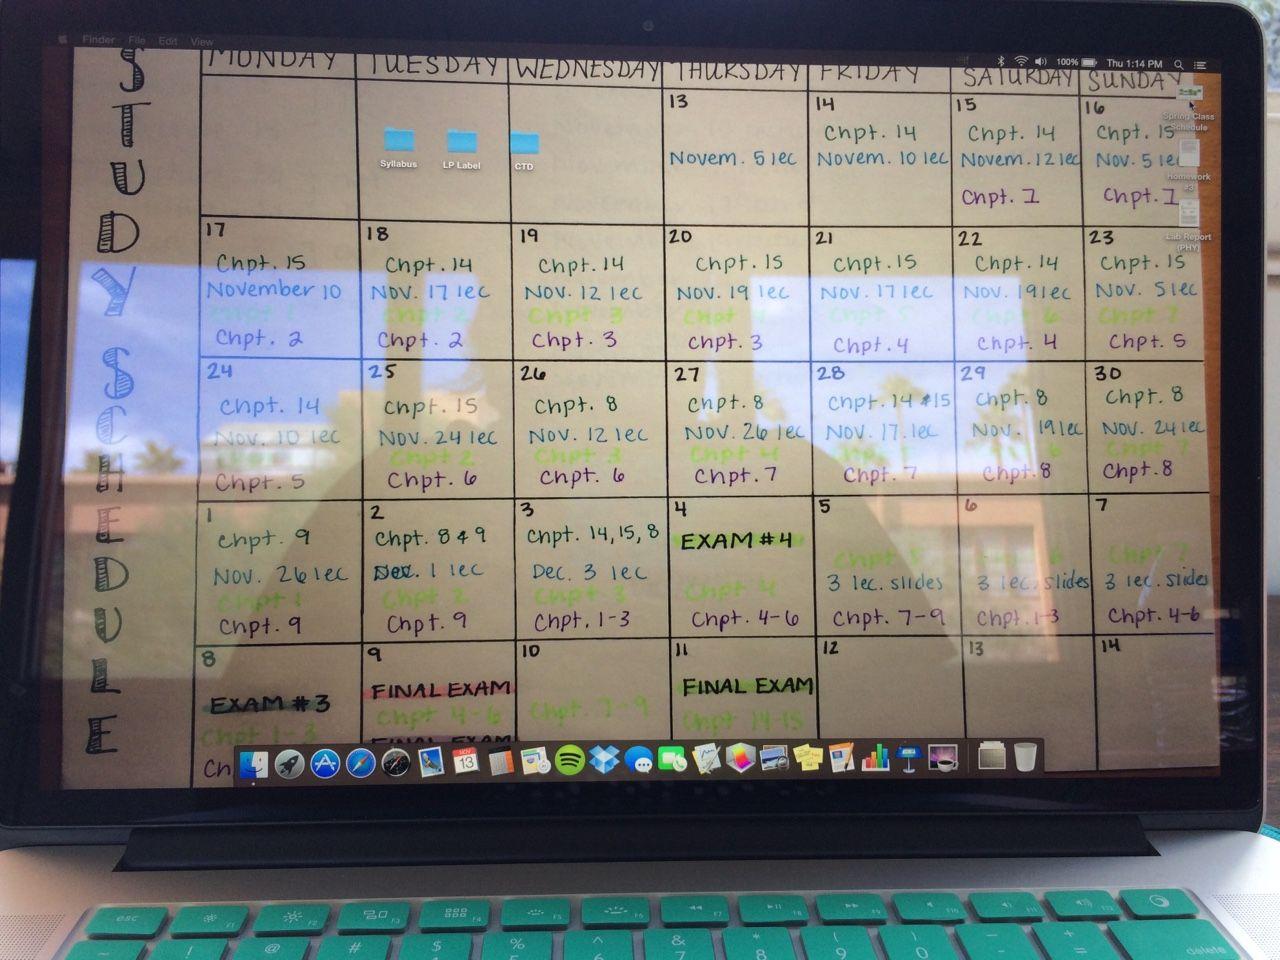 studyforsuccess: I always make my study schedule my wallpaper ...